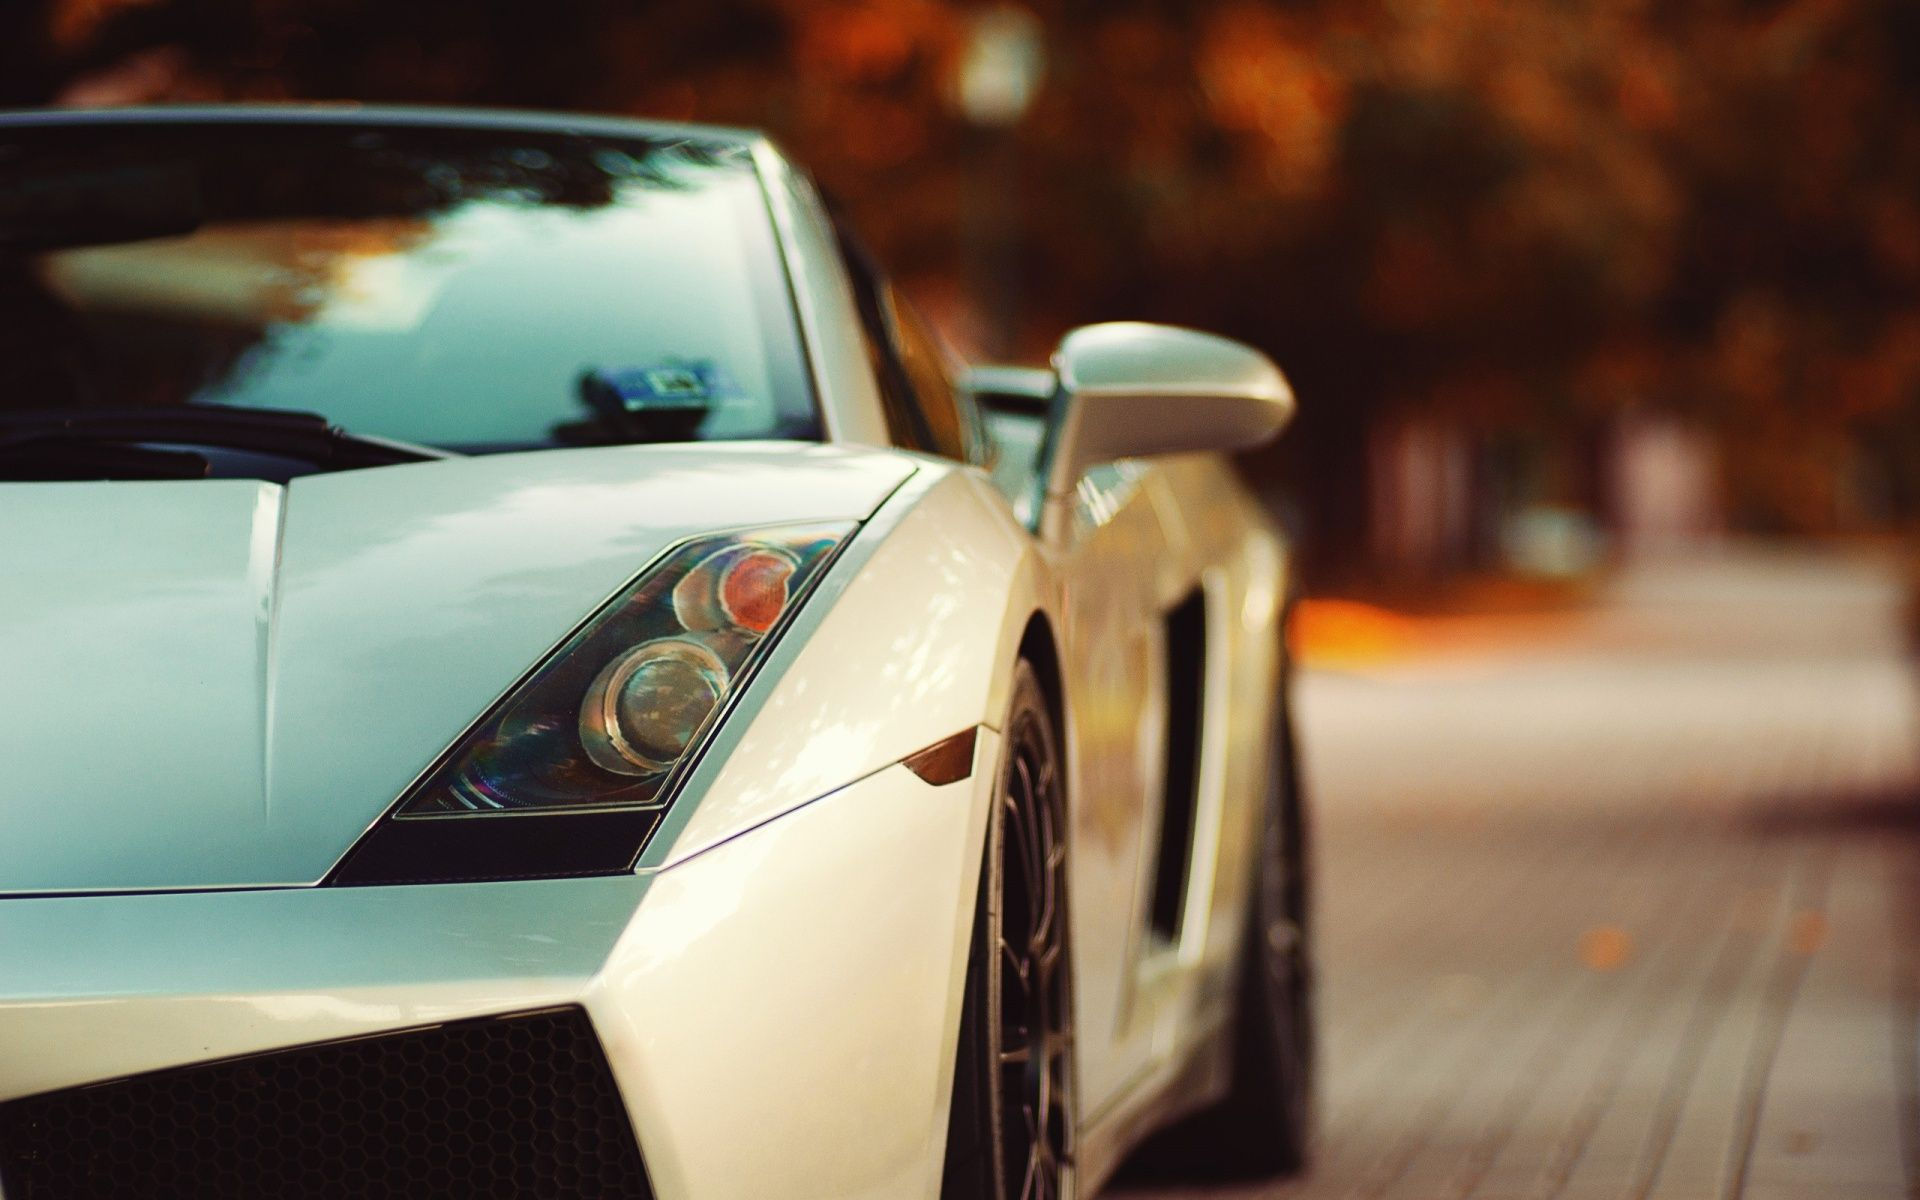 Bugatti Veyron Sang Bleu Wallpaper Autos Rennen